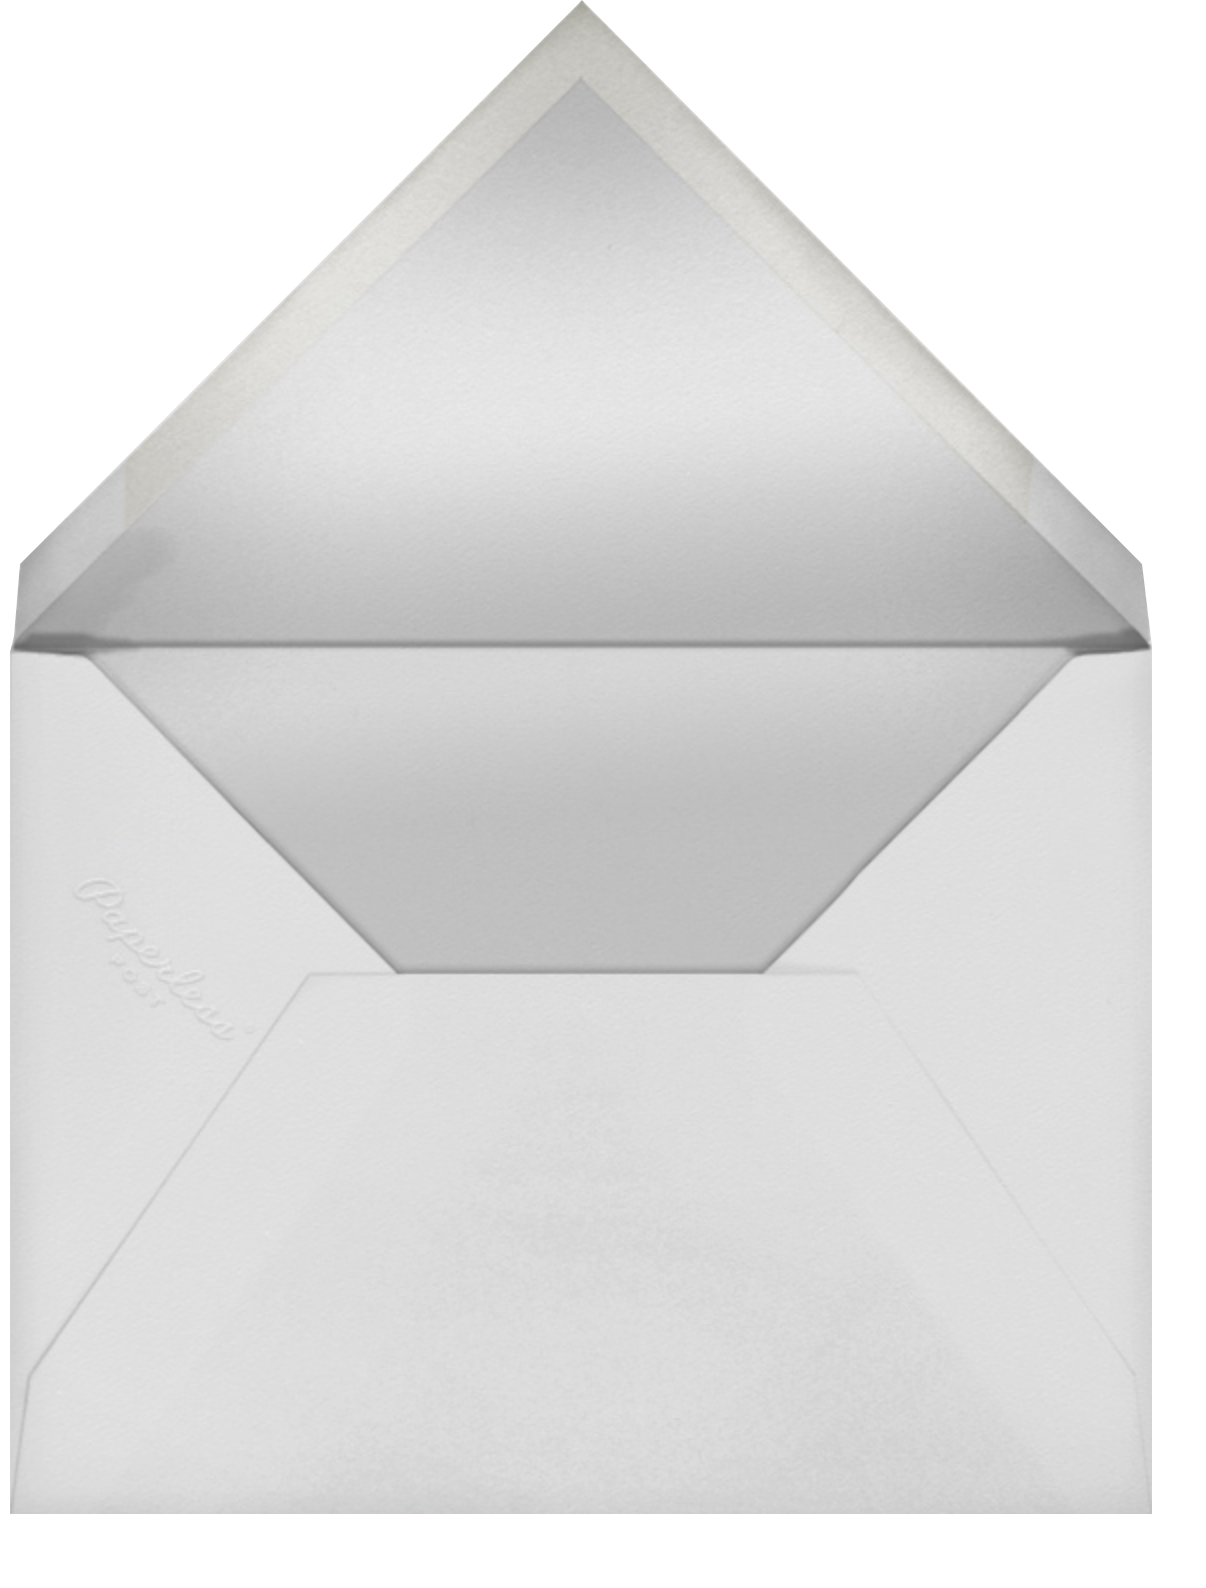 Teablossom (Menu) - Paperless Post - Menus - envelope back